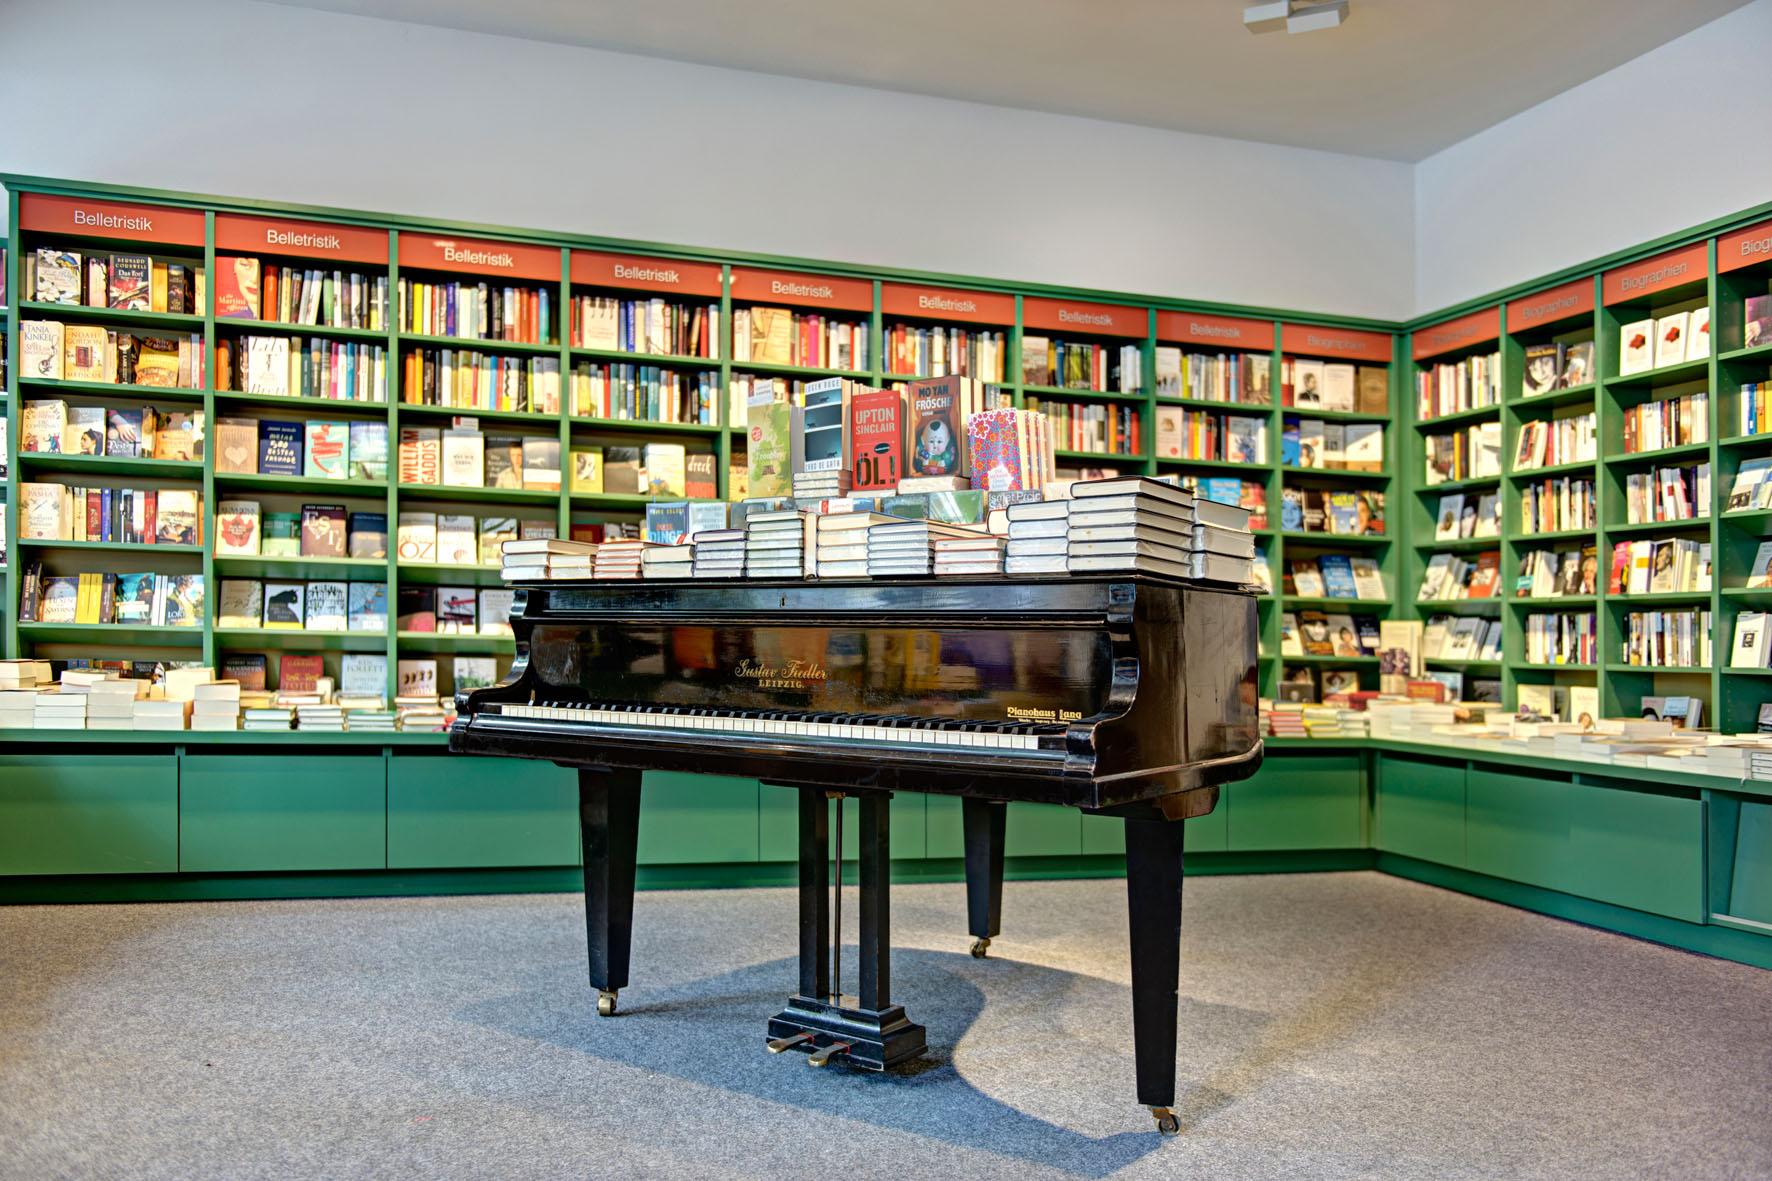 Kurz Vorgestellt: Buchhandlung Lehmkuhl